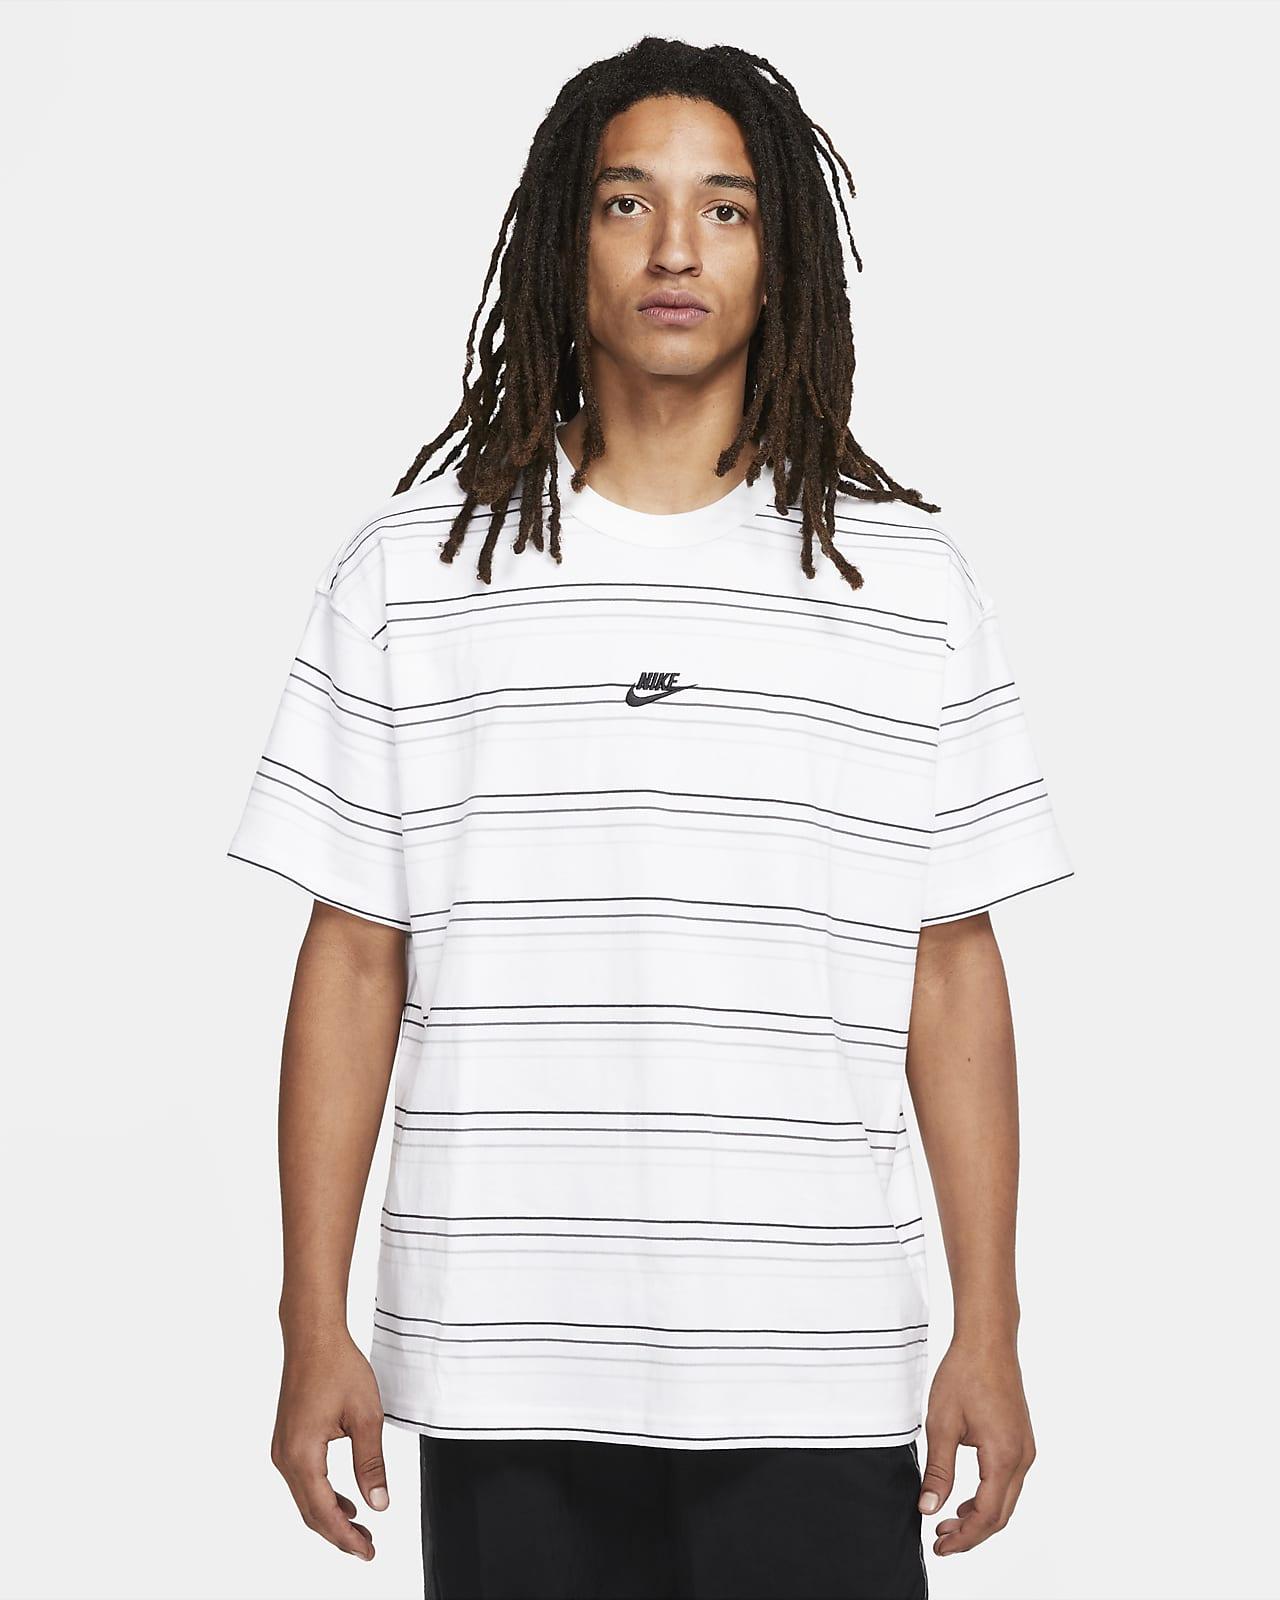 Nike Sportswear Premium Essentials Men's T-shirt